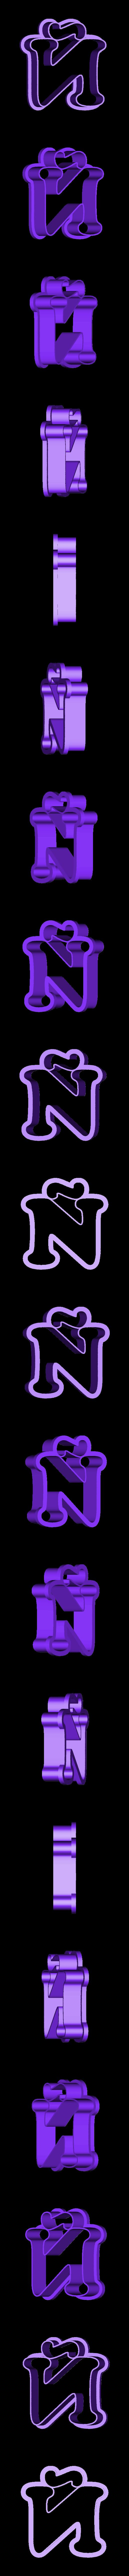 Ñ.stl Download STL file sharp letters Cooper Black • 3D printing model, juanchininaiara